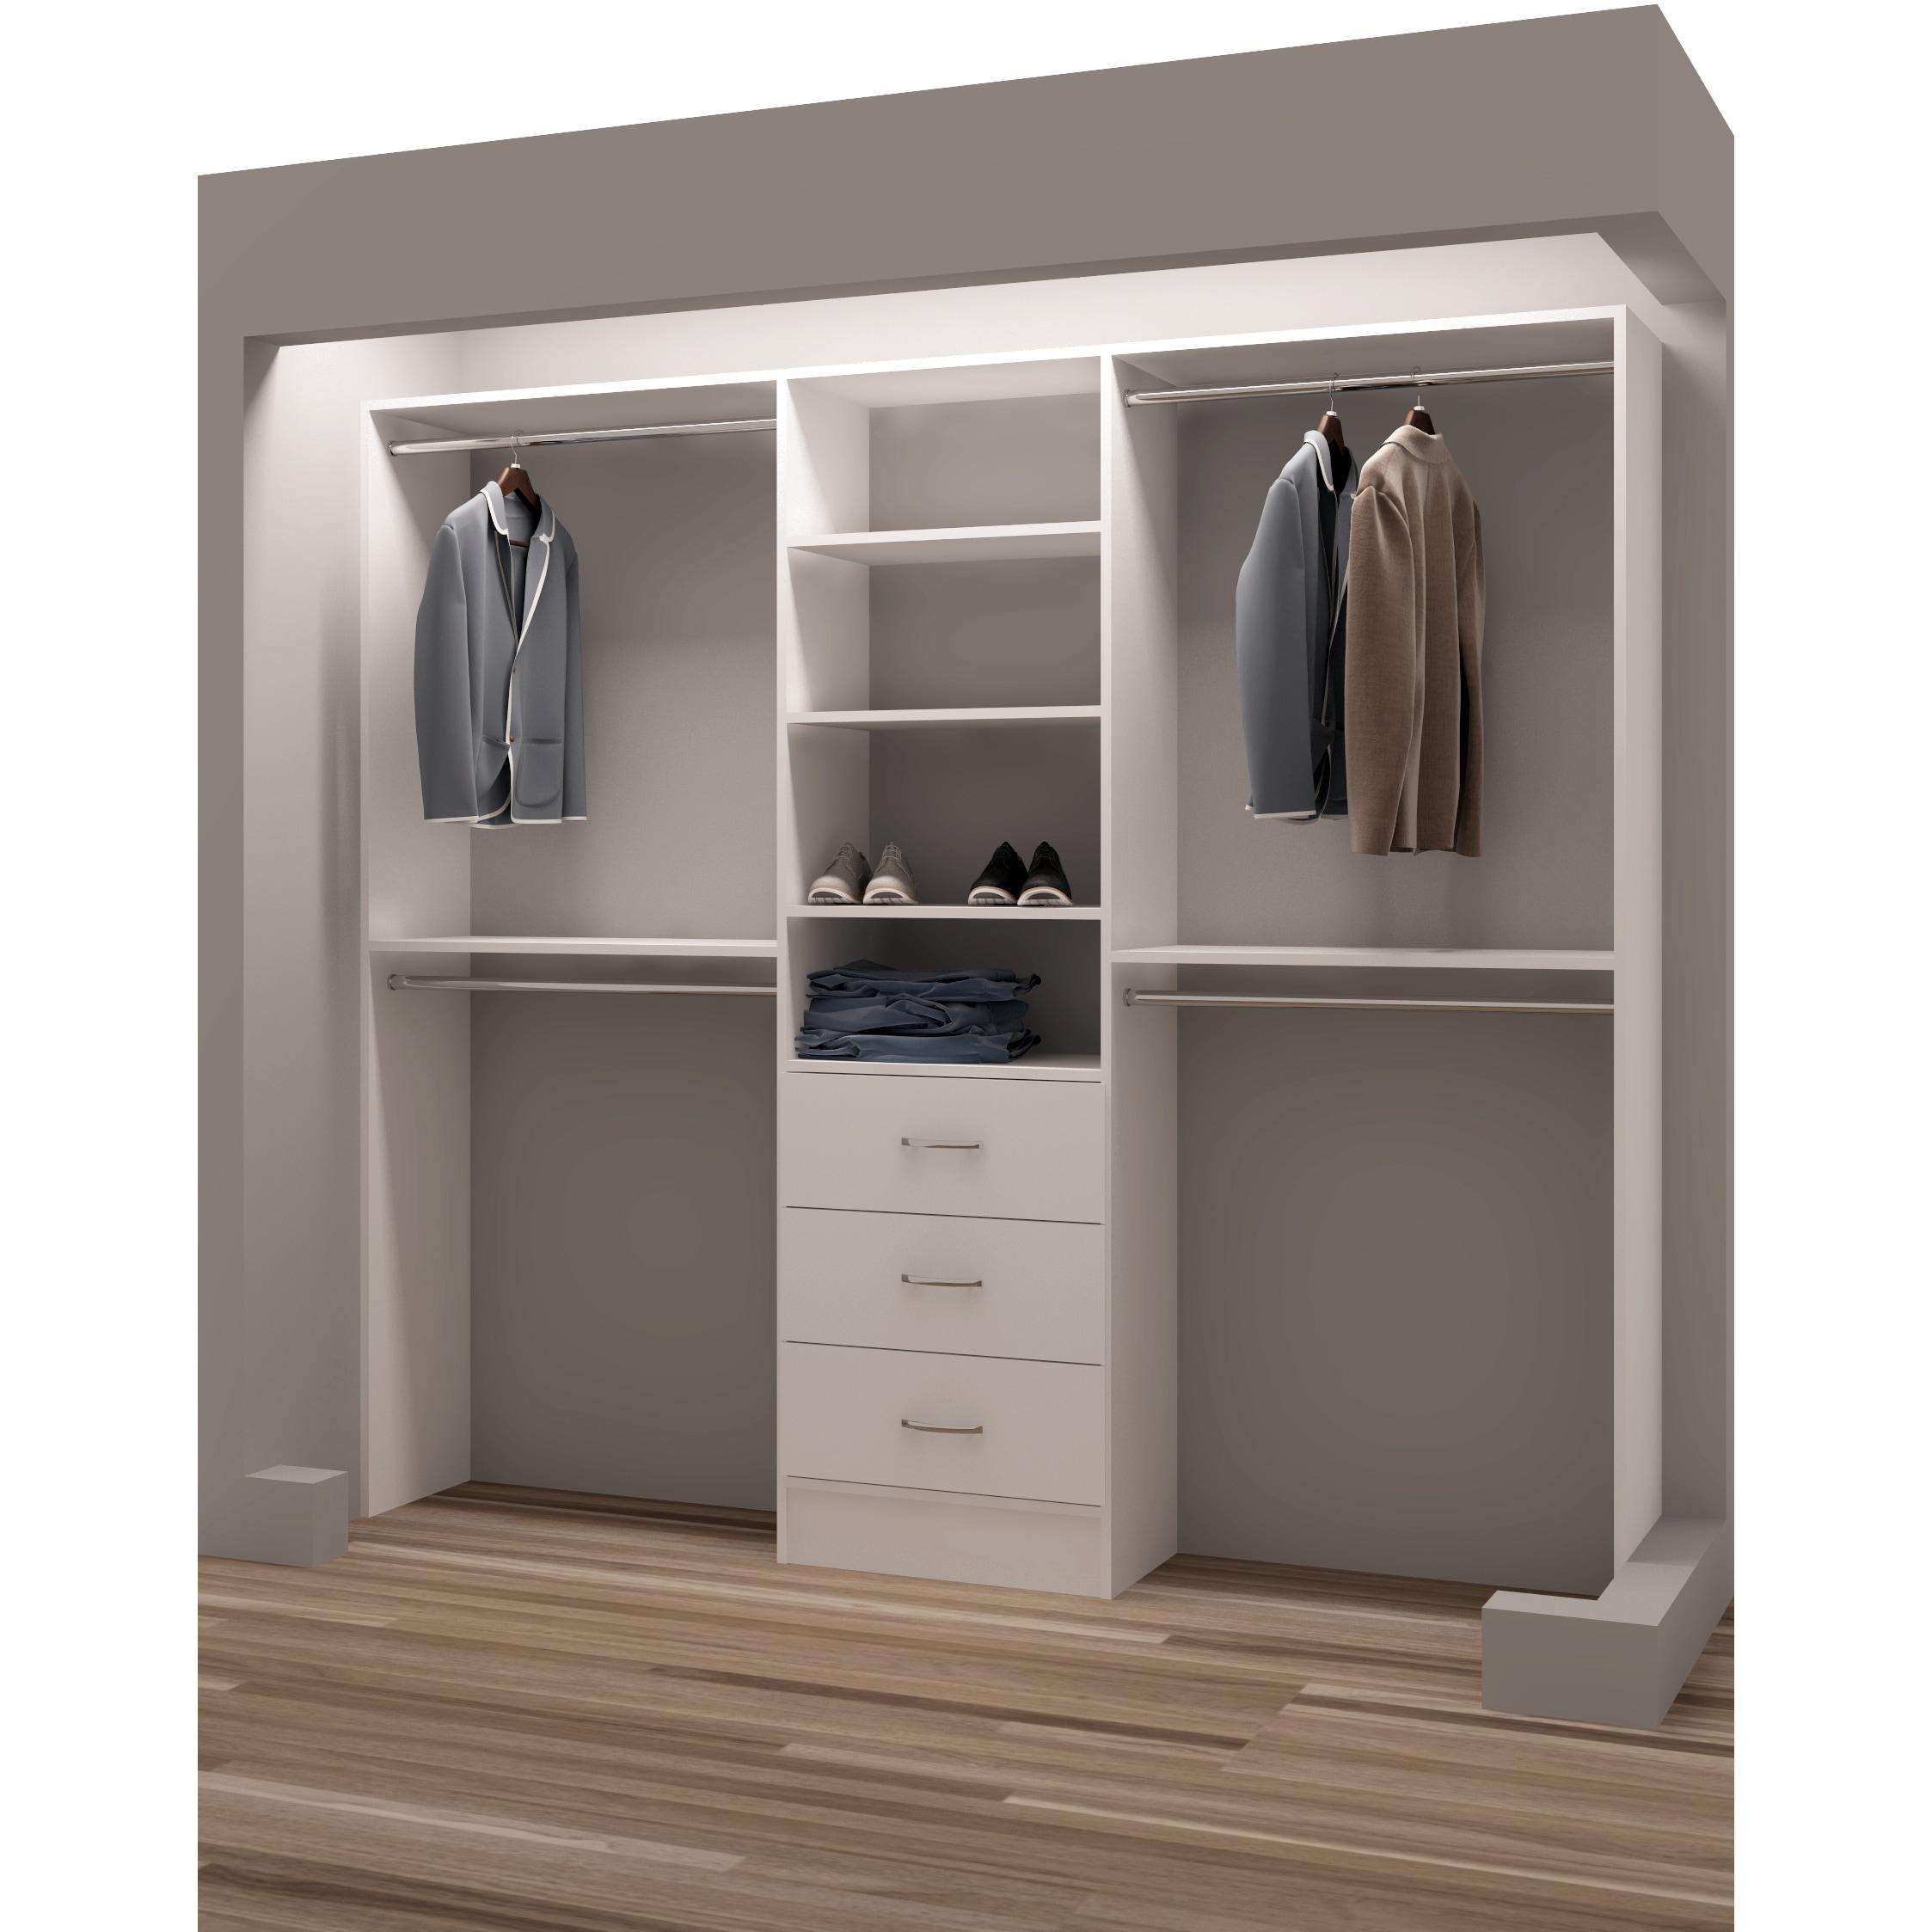 Shop Tidysquares White Wood 87 Inch Reach In Closet Organizer Overstock 13223586